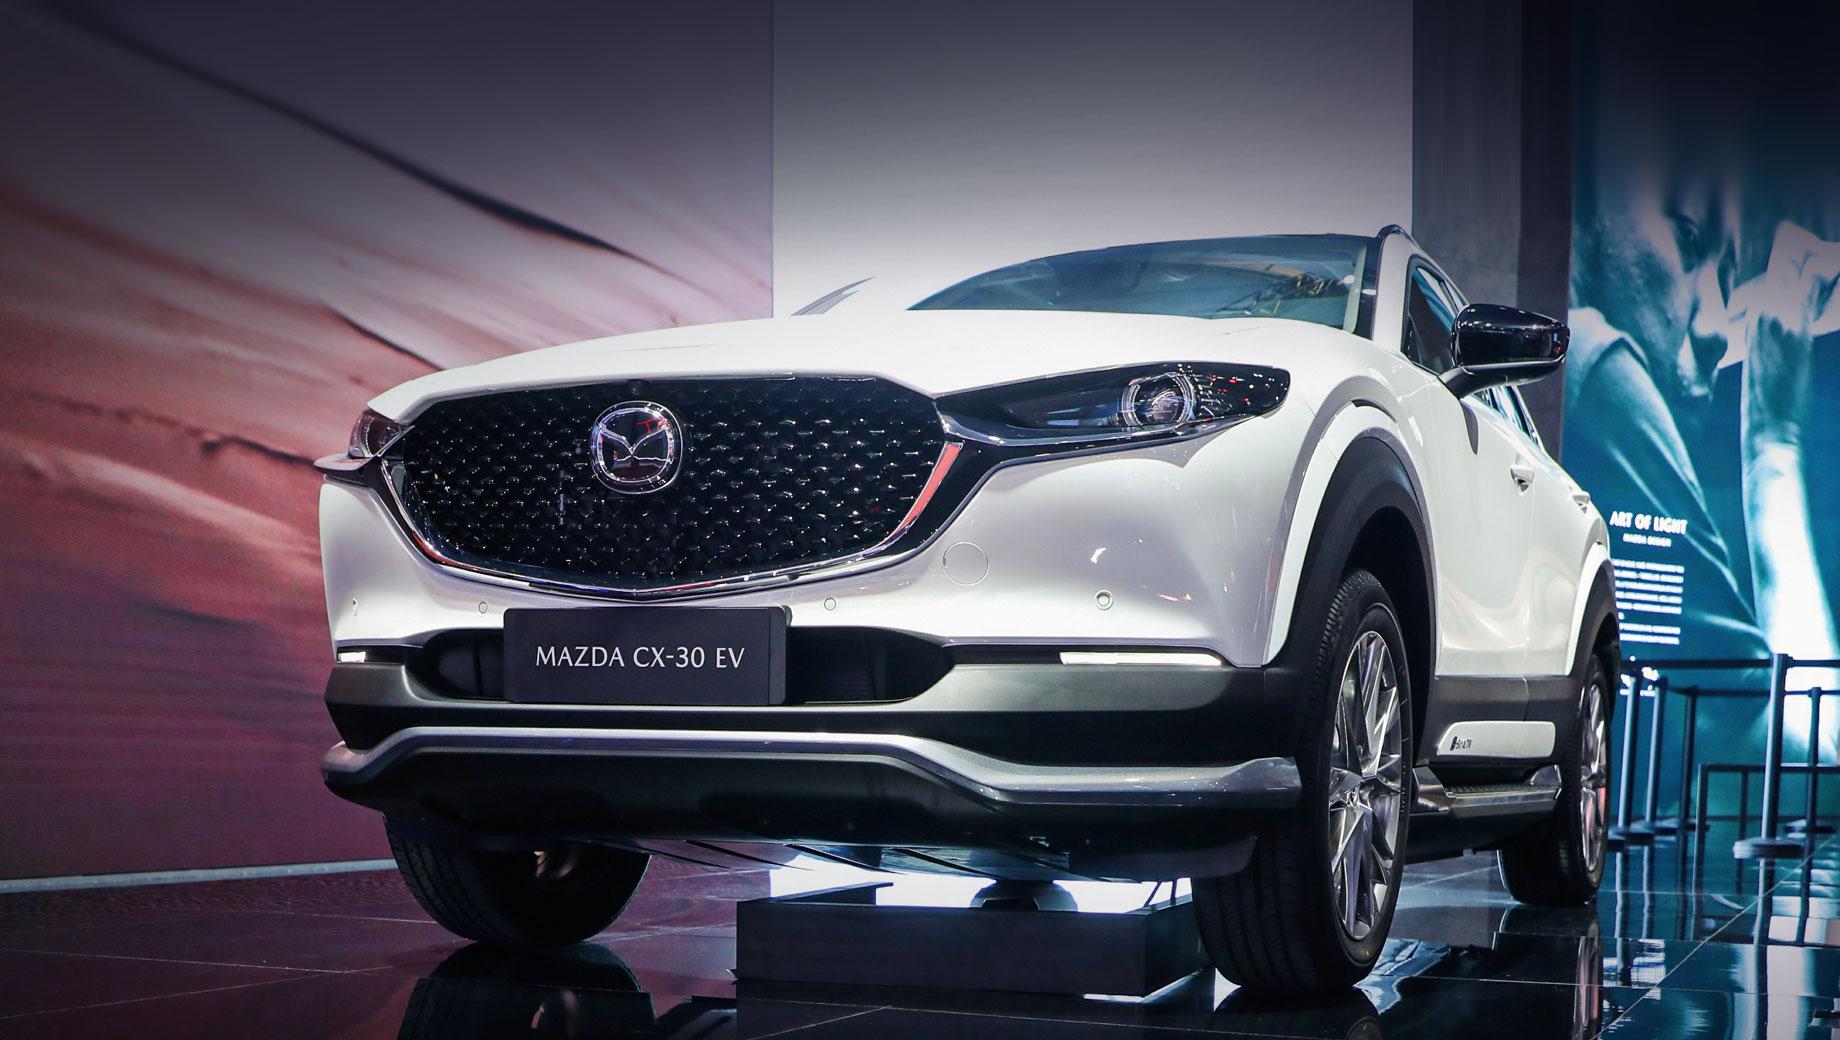 Mazda CX-30 перешла на электротягу для китайского рынка